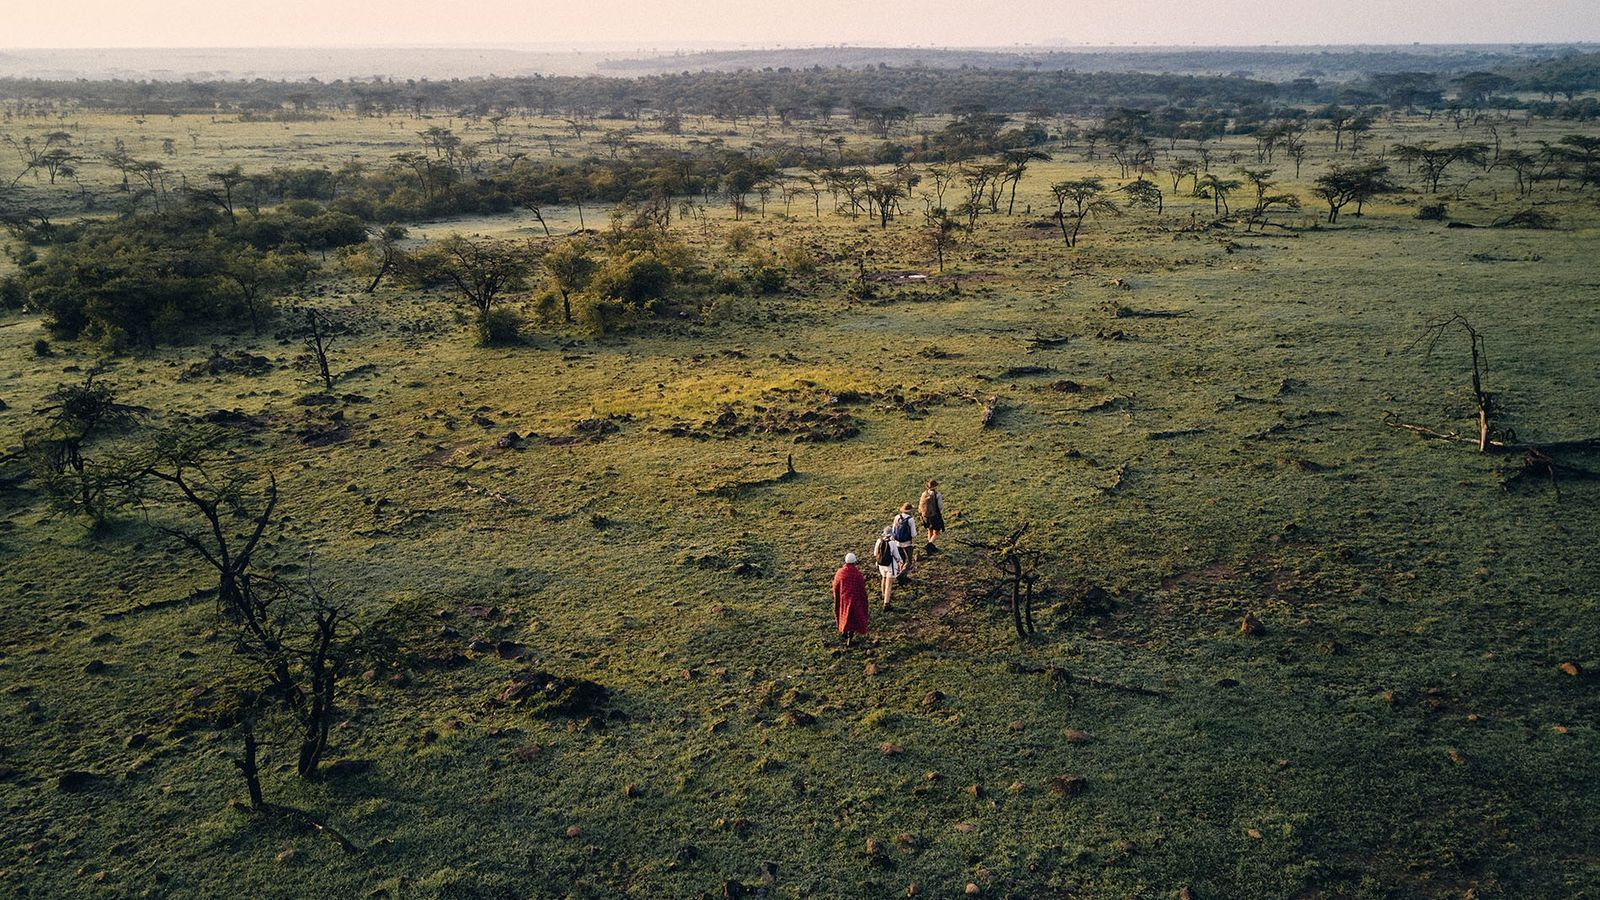 A walking safari in Naboisho Conservancy, north of Maasai Mara National Reserve.